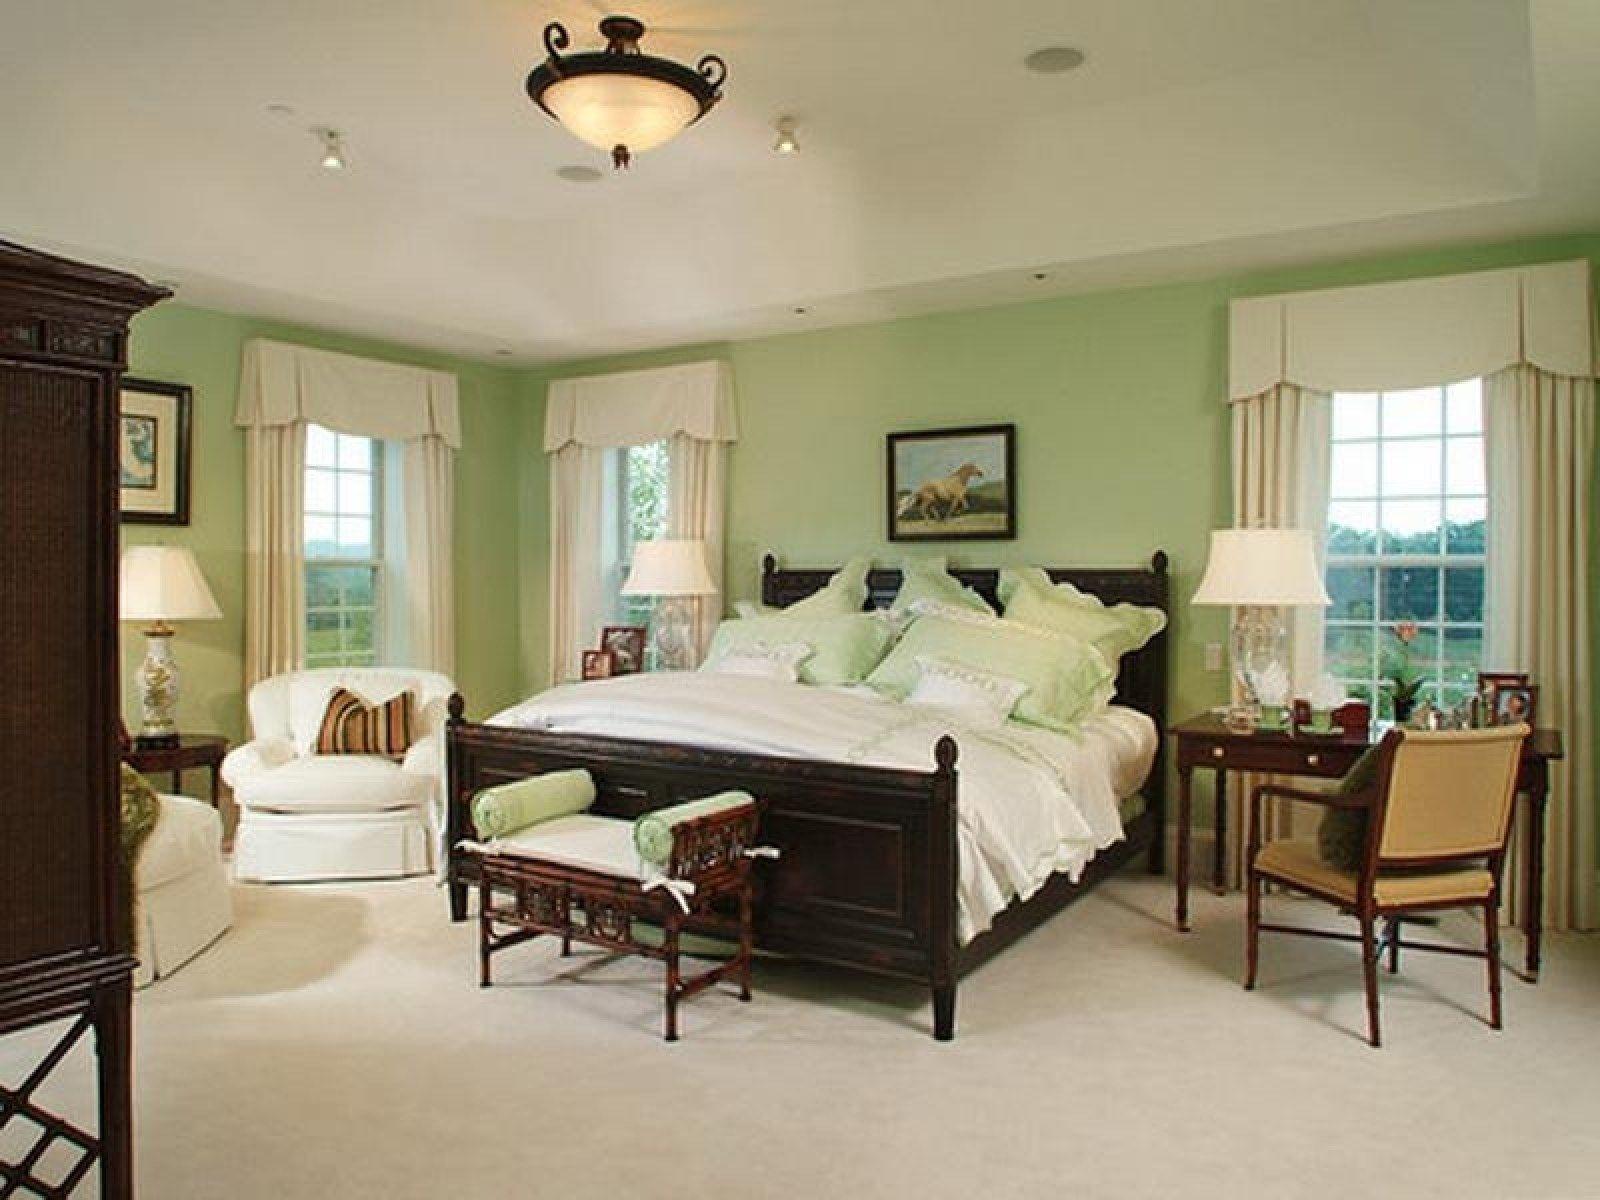 Grün Schlafzimmer Wände Mint green bedroom, Green